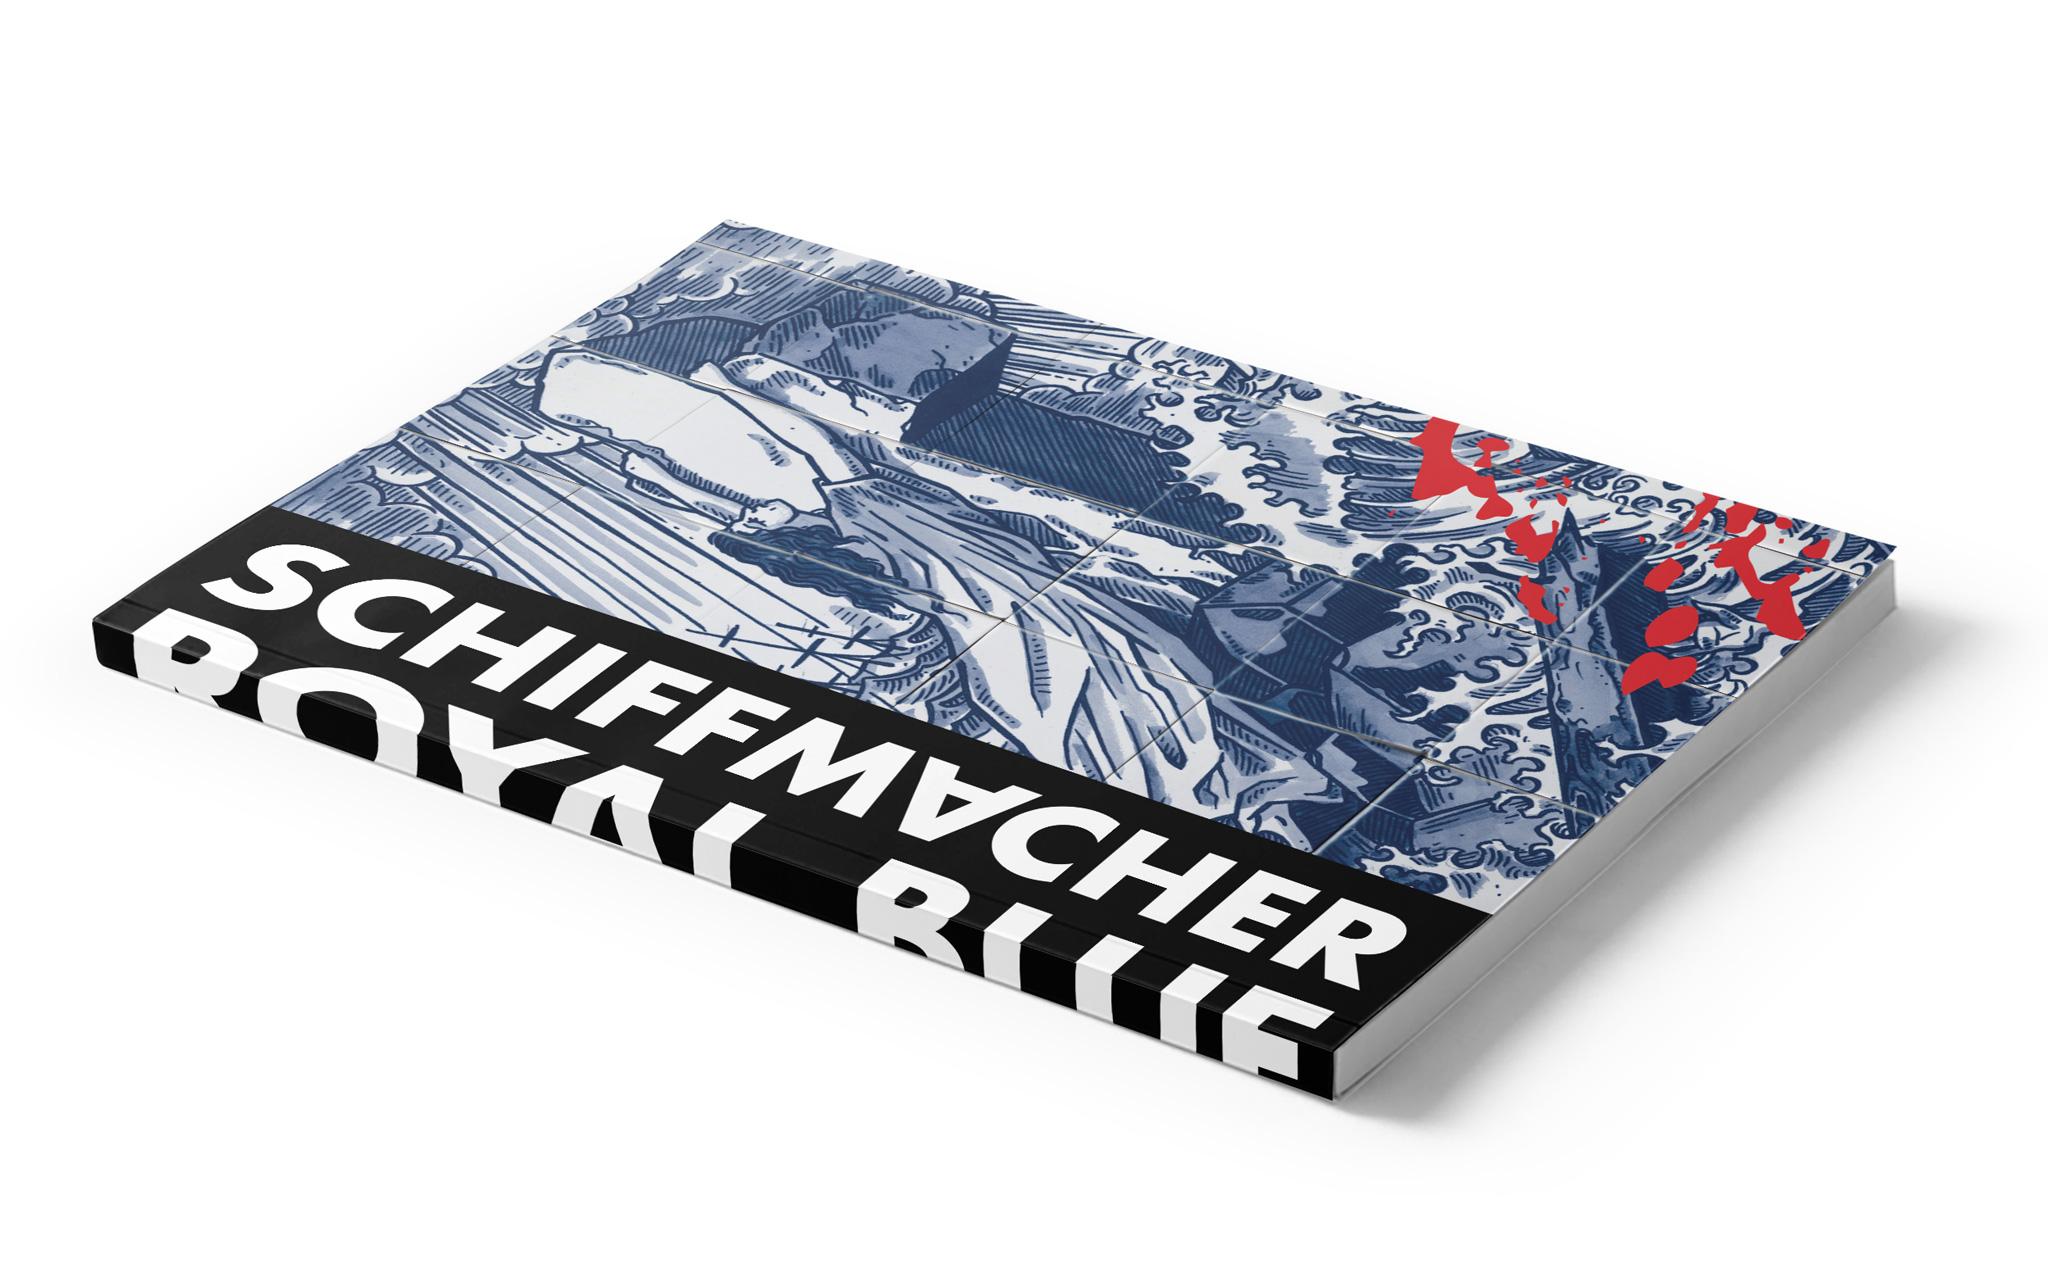 Schiffmacher Royal Blue Tattoo boek